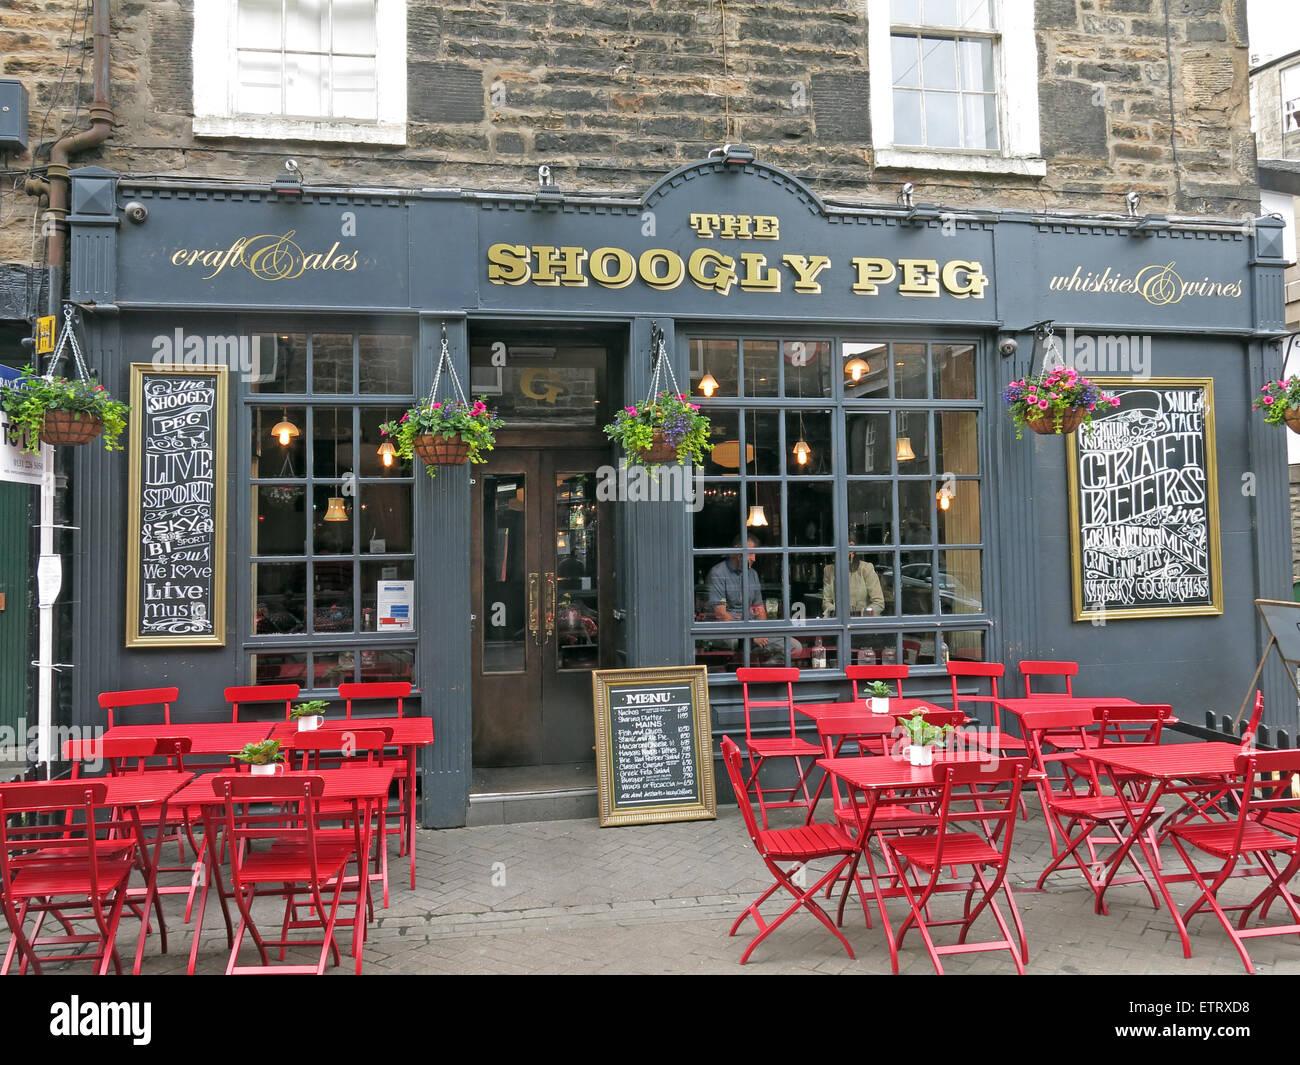 The Shoogly Peg pub, Rose St,Edinburgh,Scotland,UK Stock Photo